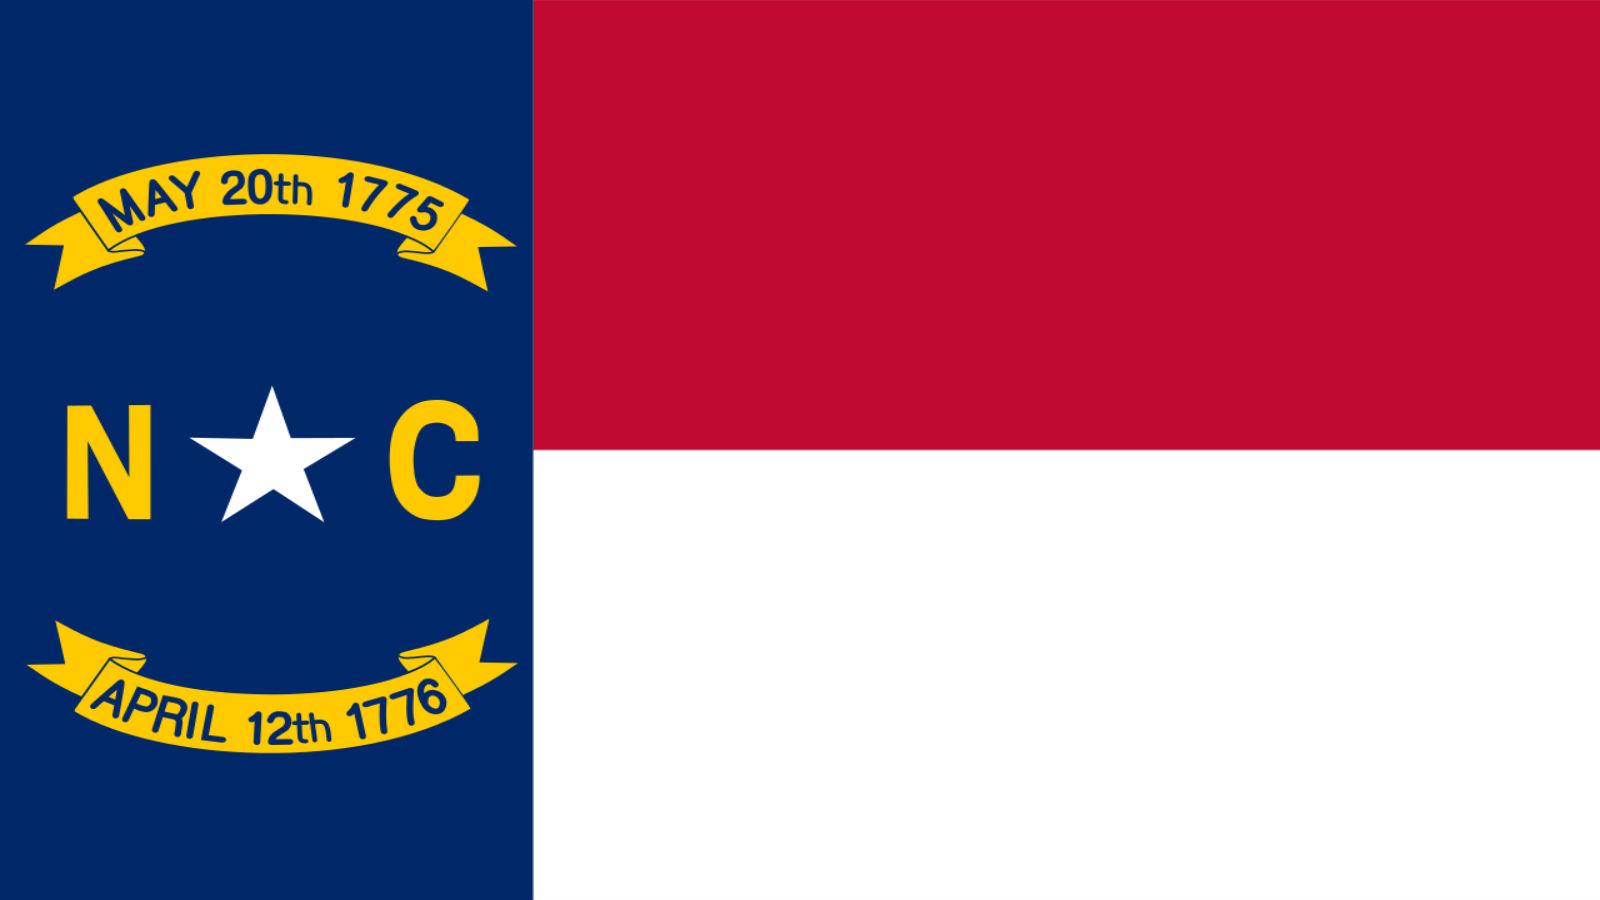 Discriminatory HB 142 Lawsuit Moves Forward, HRC Calls for